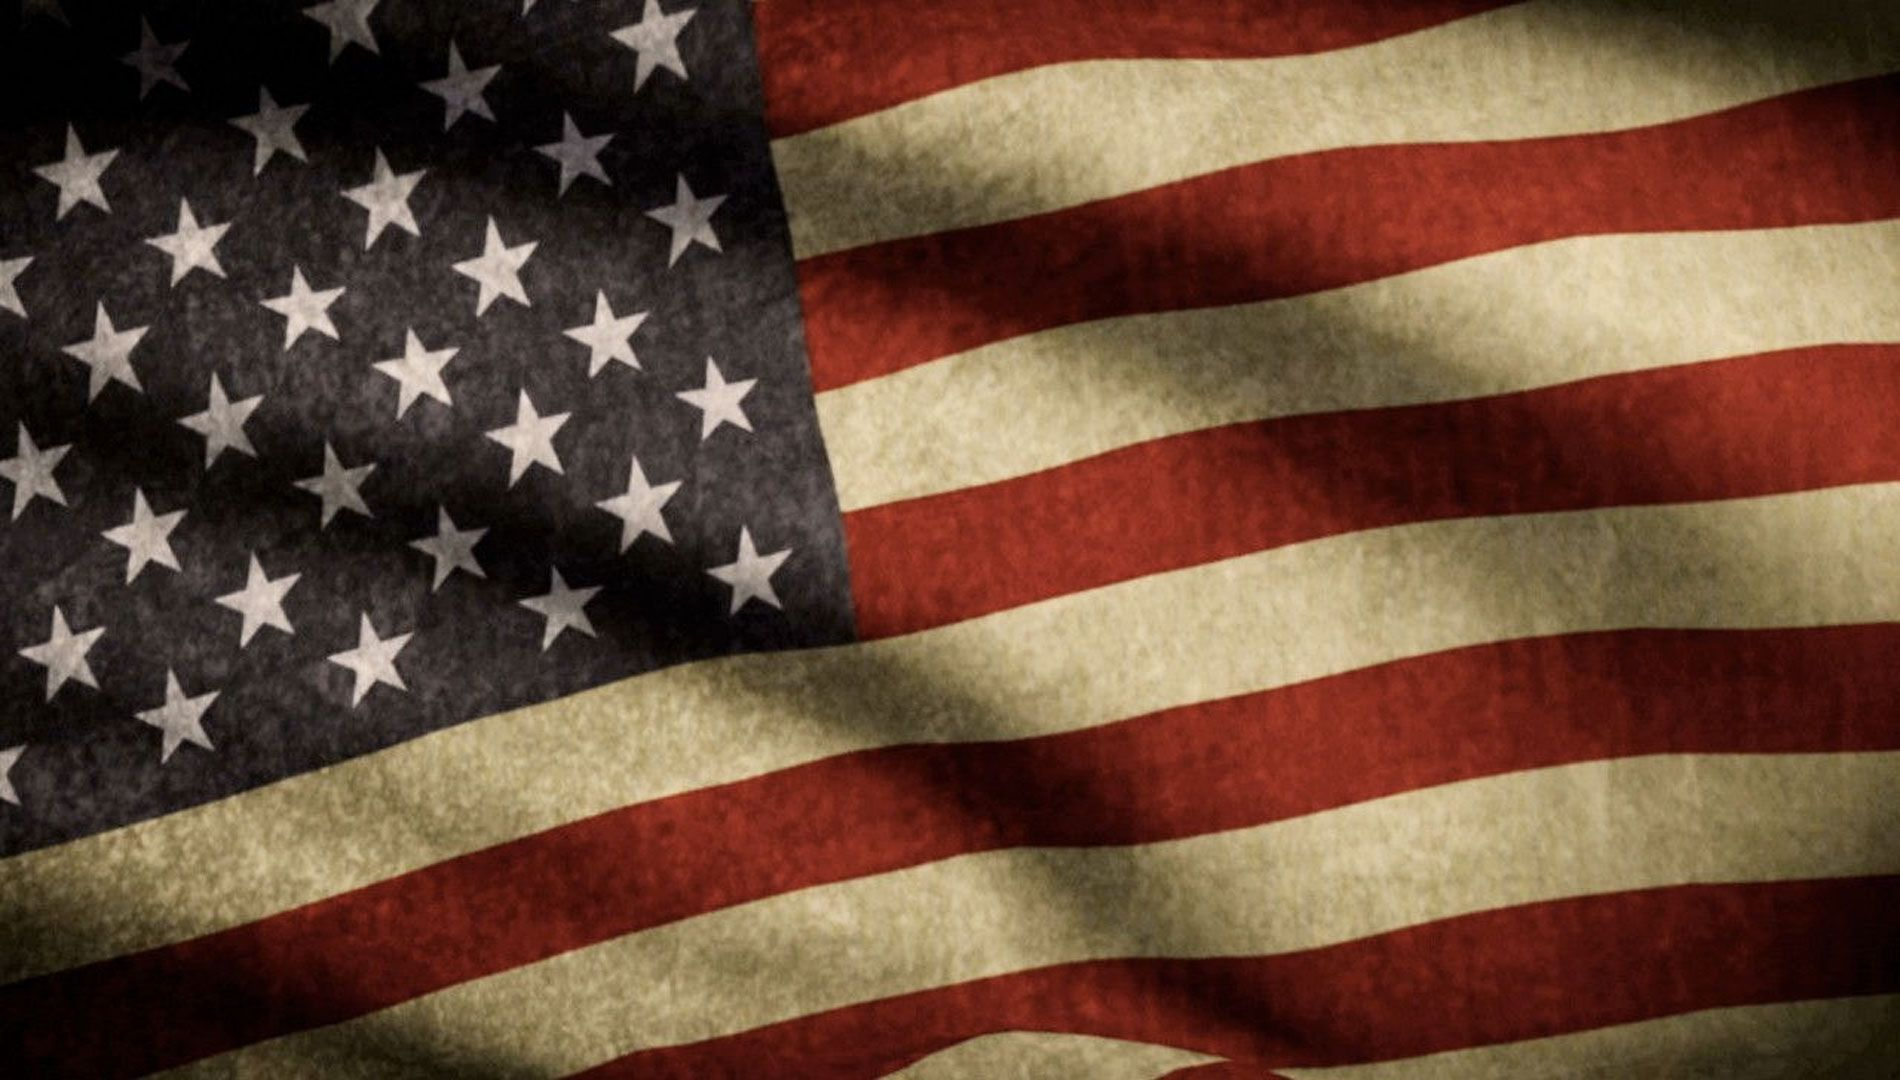 American flag wallpaper american flag images and wallpaper american flag wallpaper voltagebd Gallery